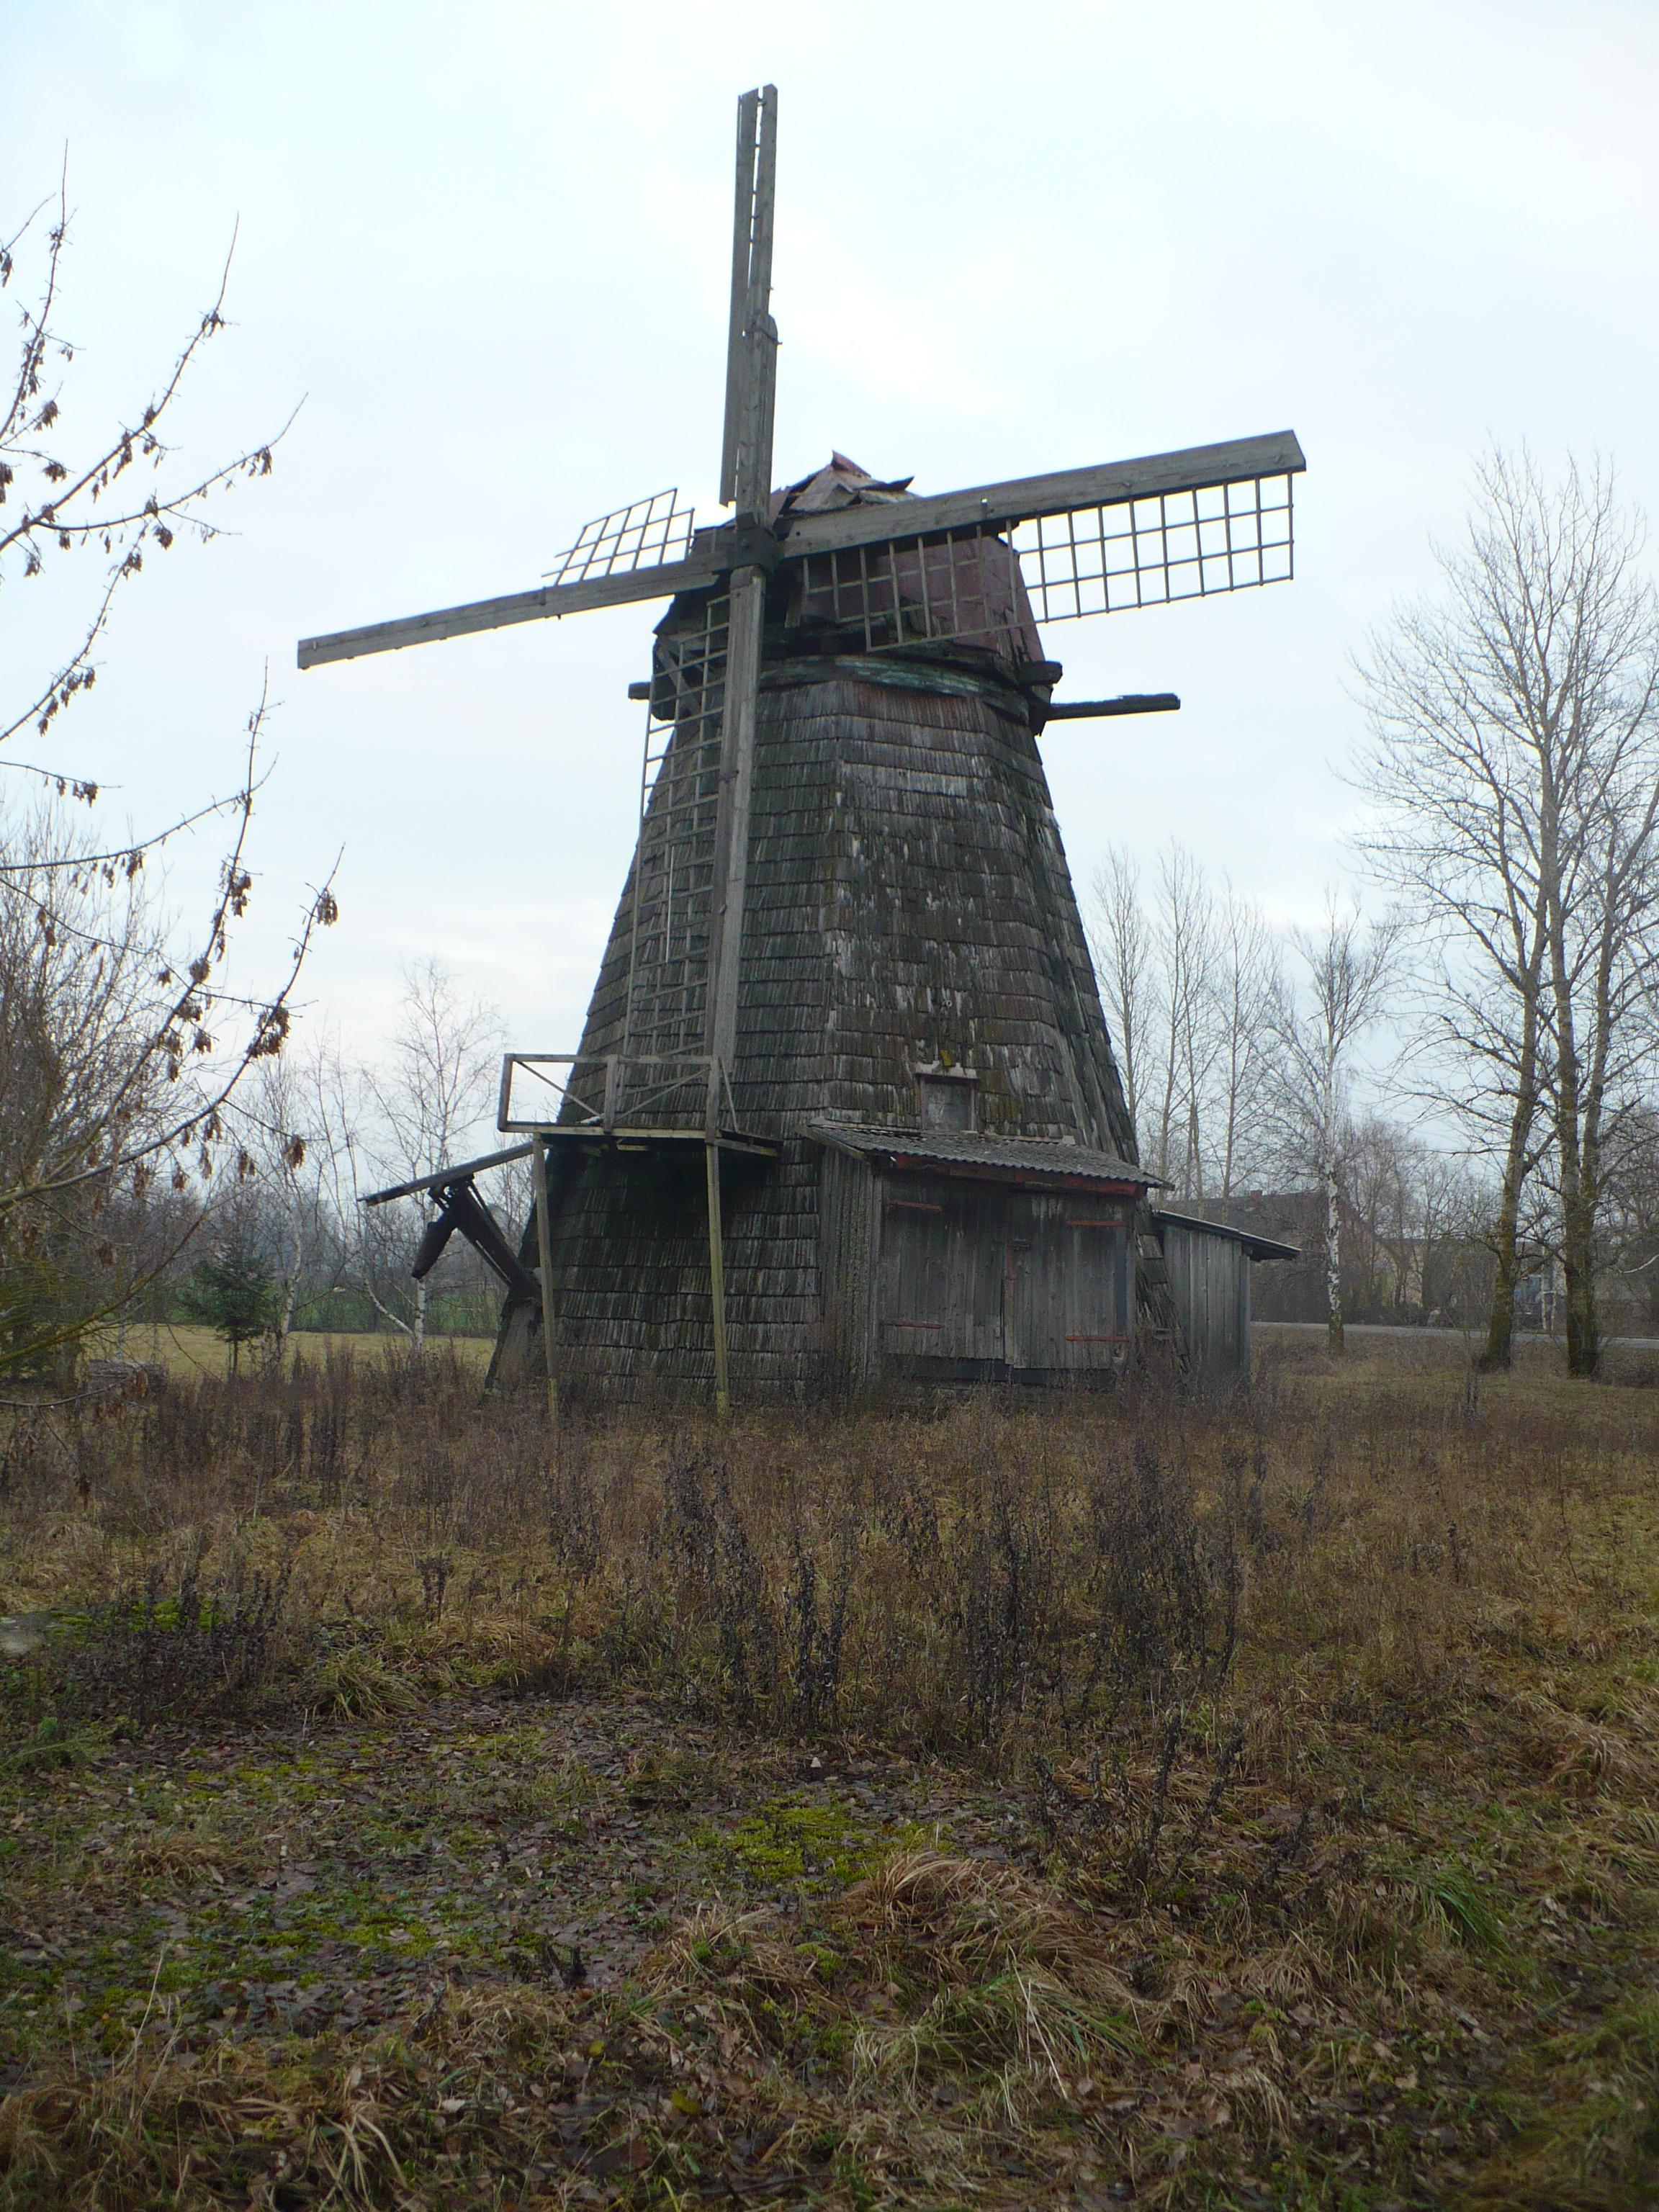 File:Old windmill - panoramio.jpg - Wikimedia Commons